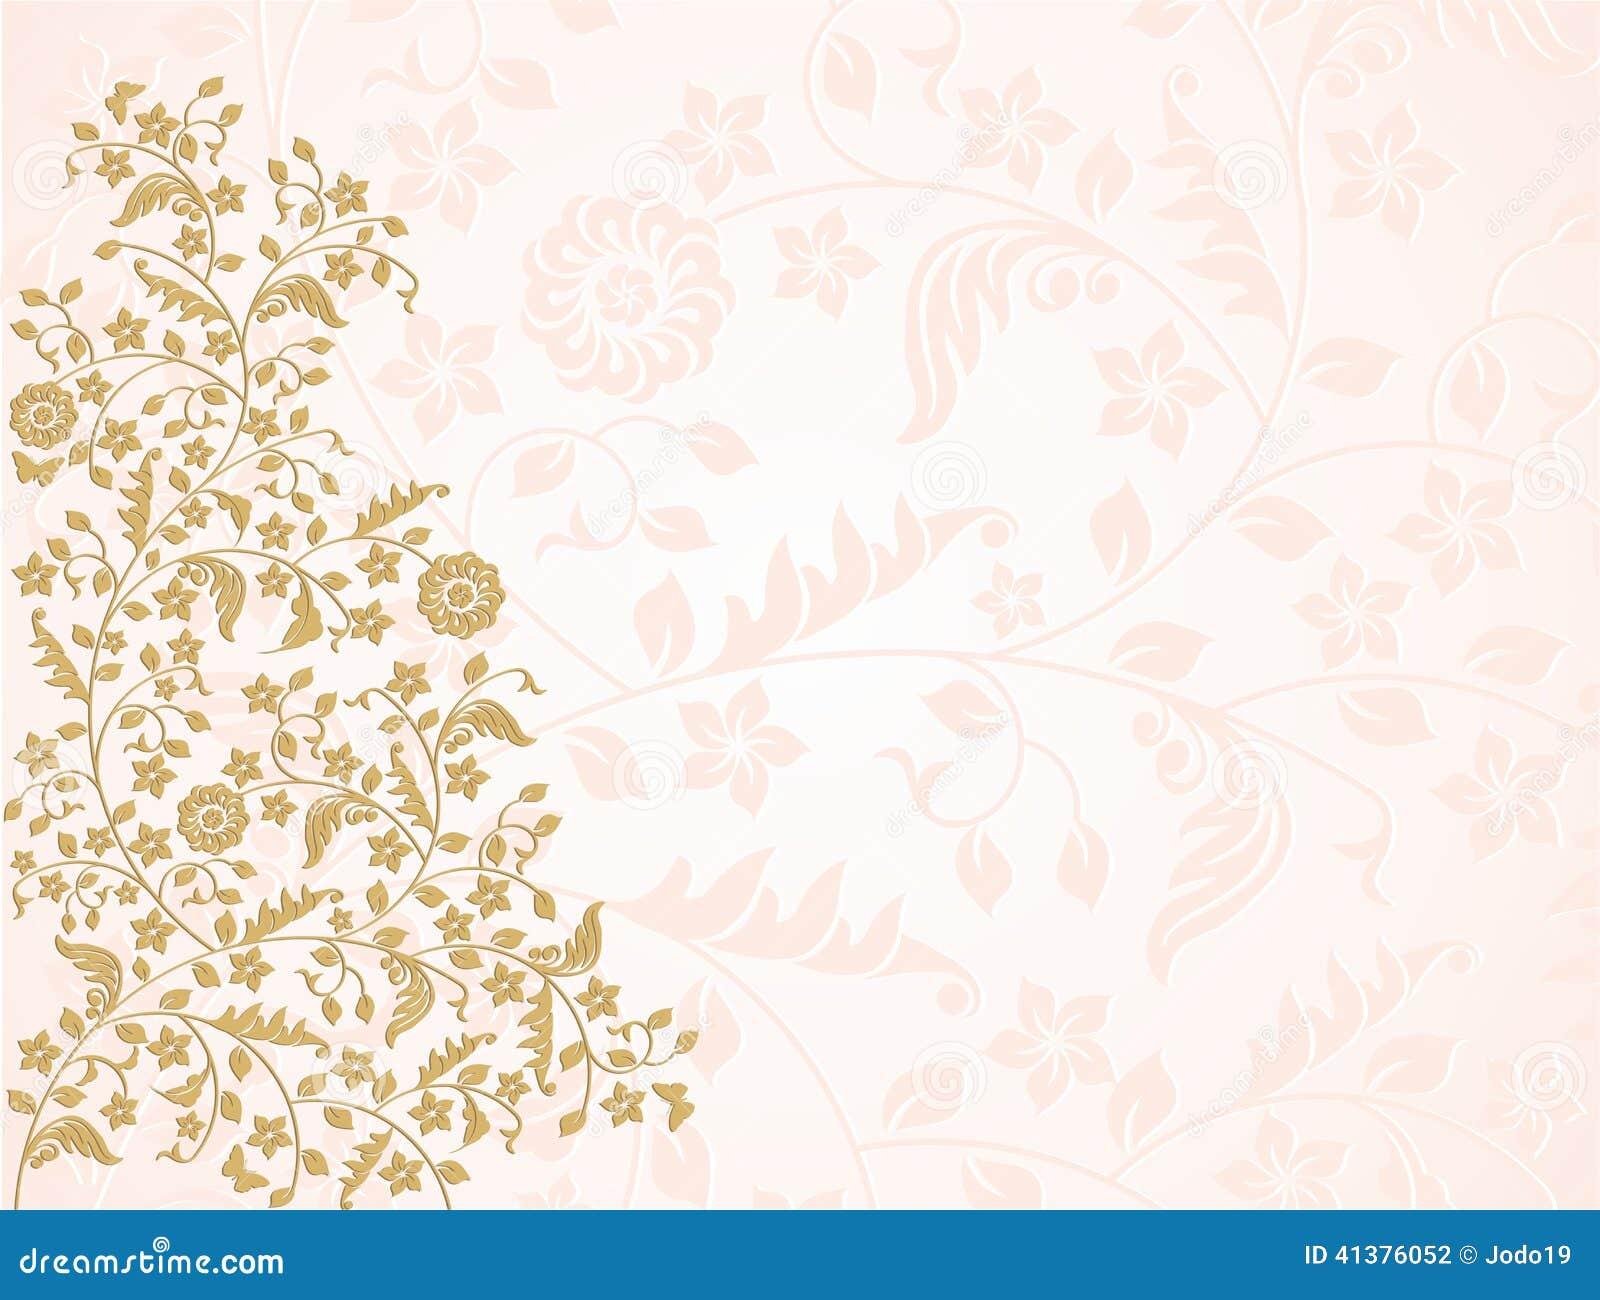 Gold flowers stock vector illustration of illustration 41376052 gold flowers mightylinksfo